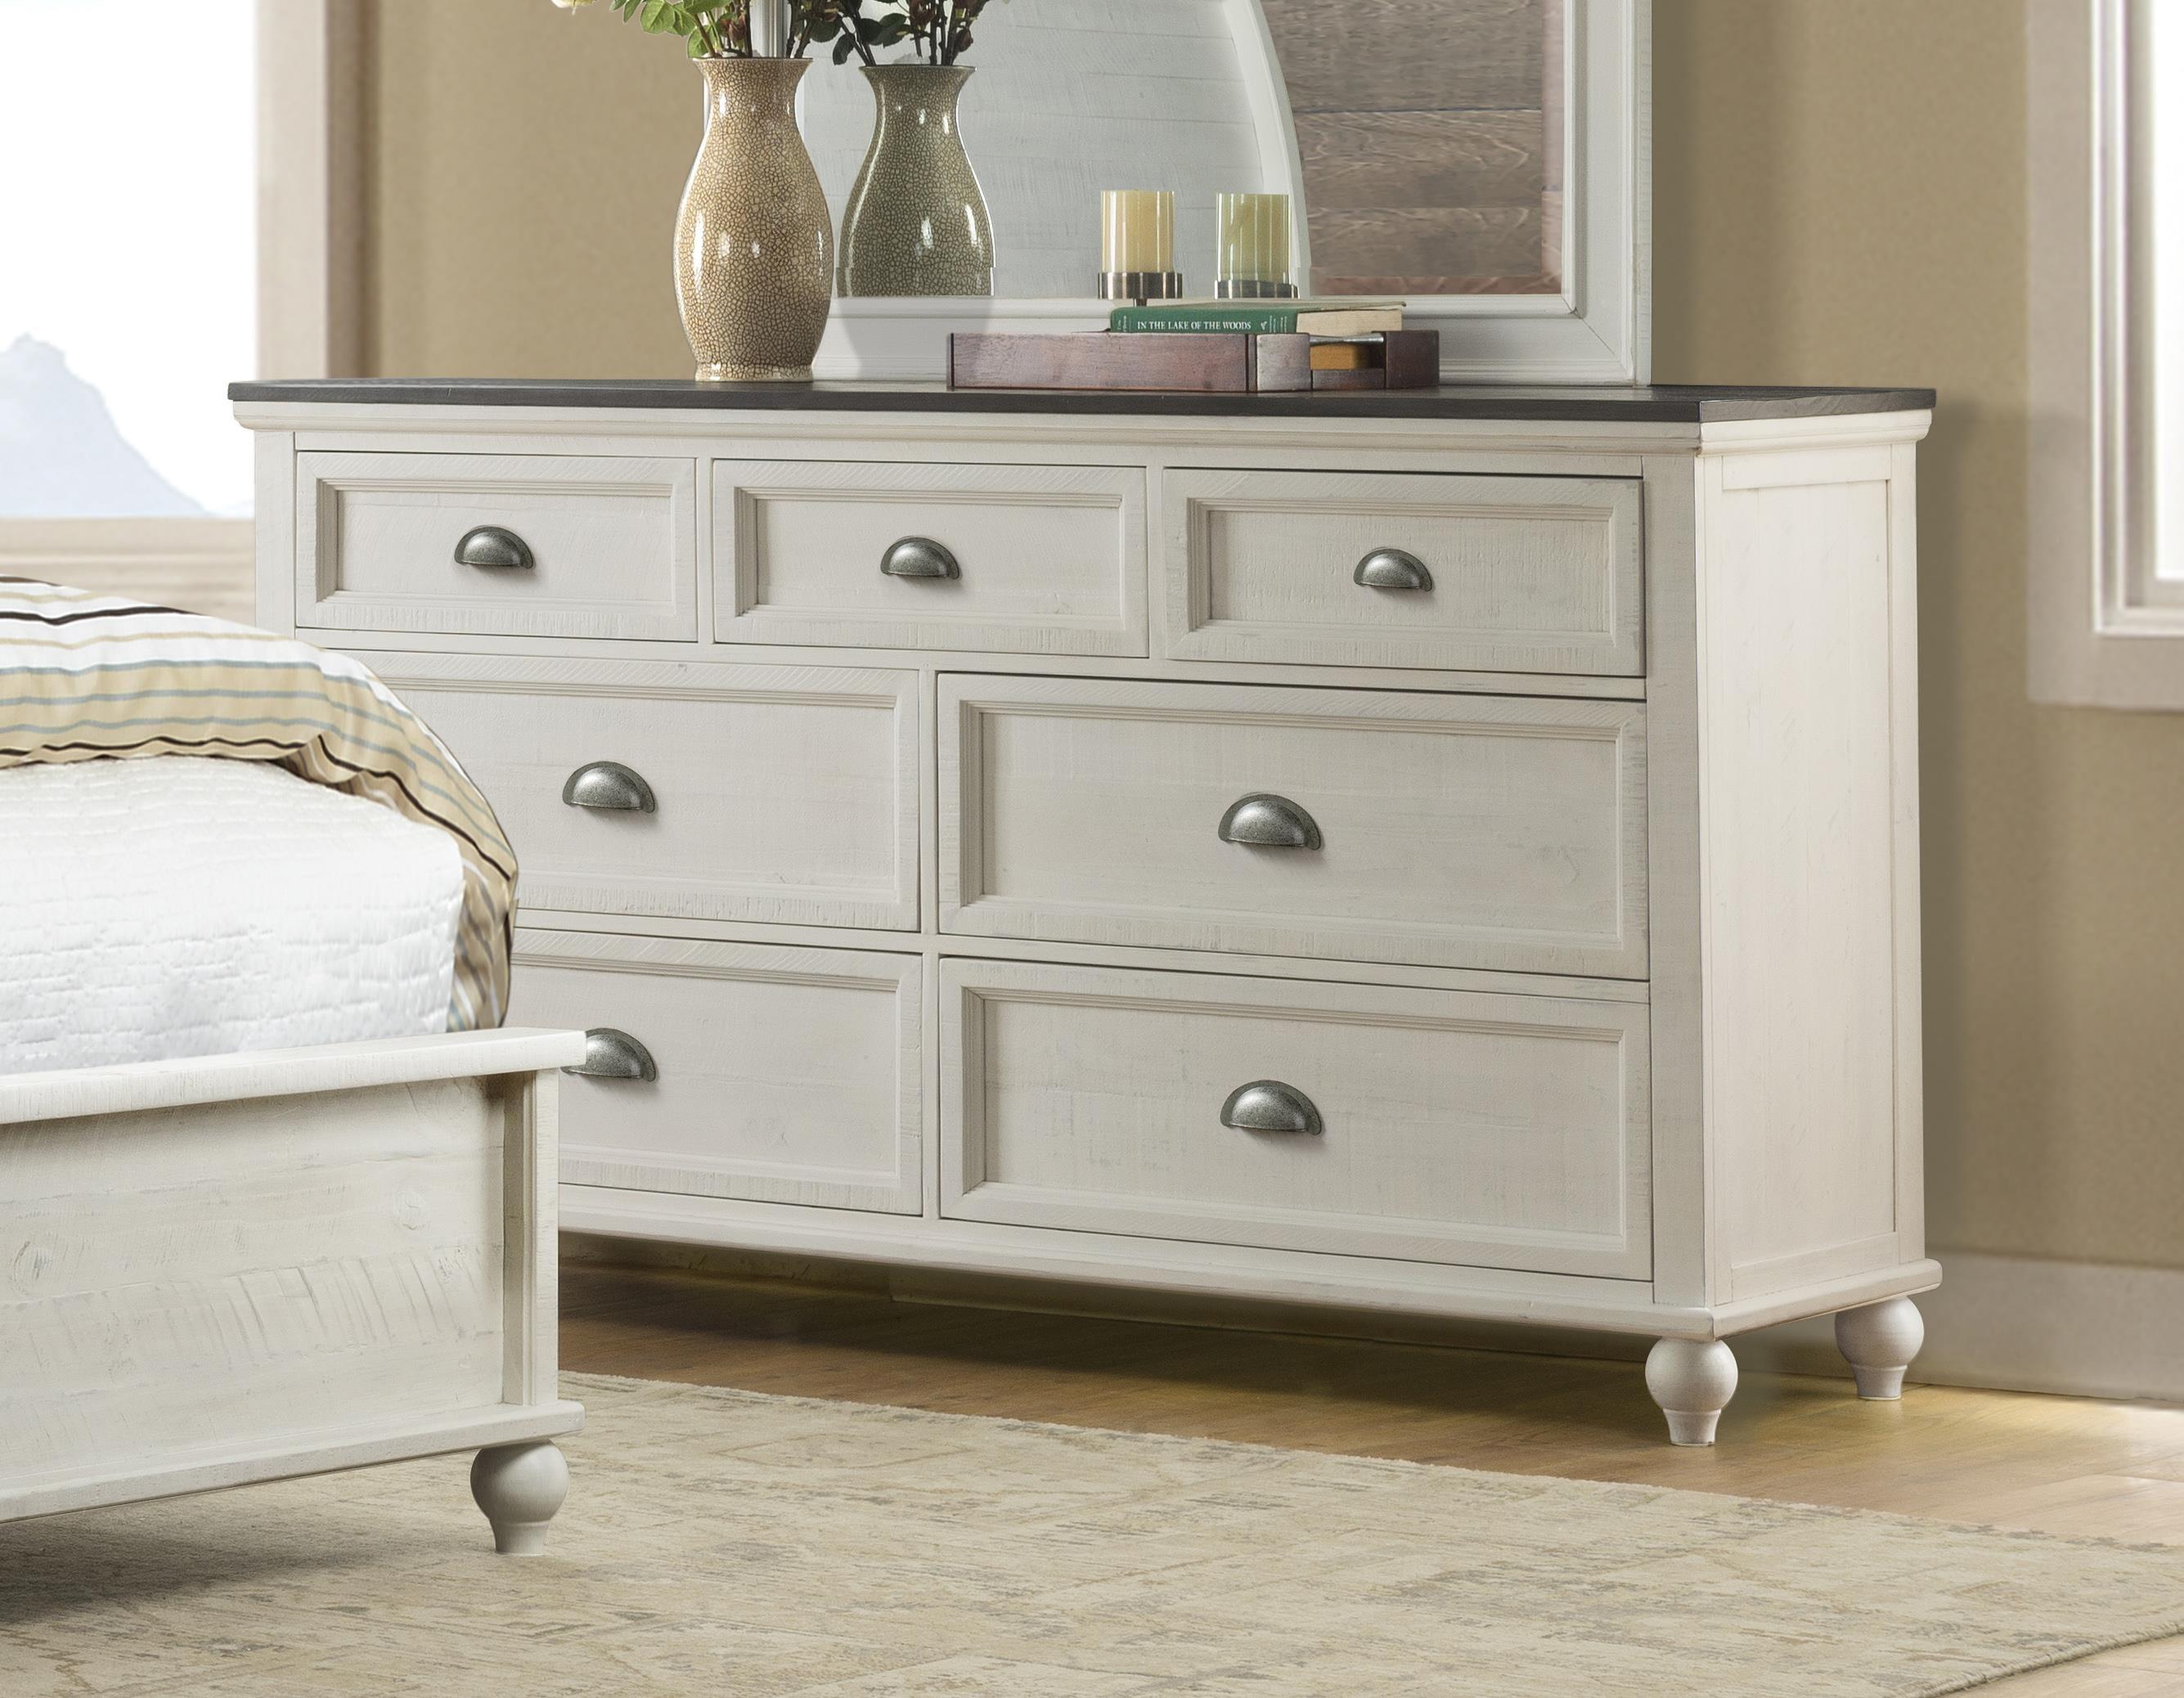 Monterey Dresser by Martin Svensson Home at Sam Levitz Furniture